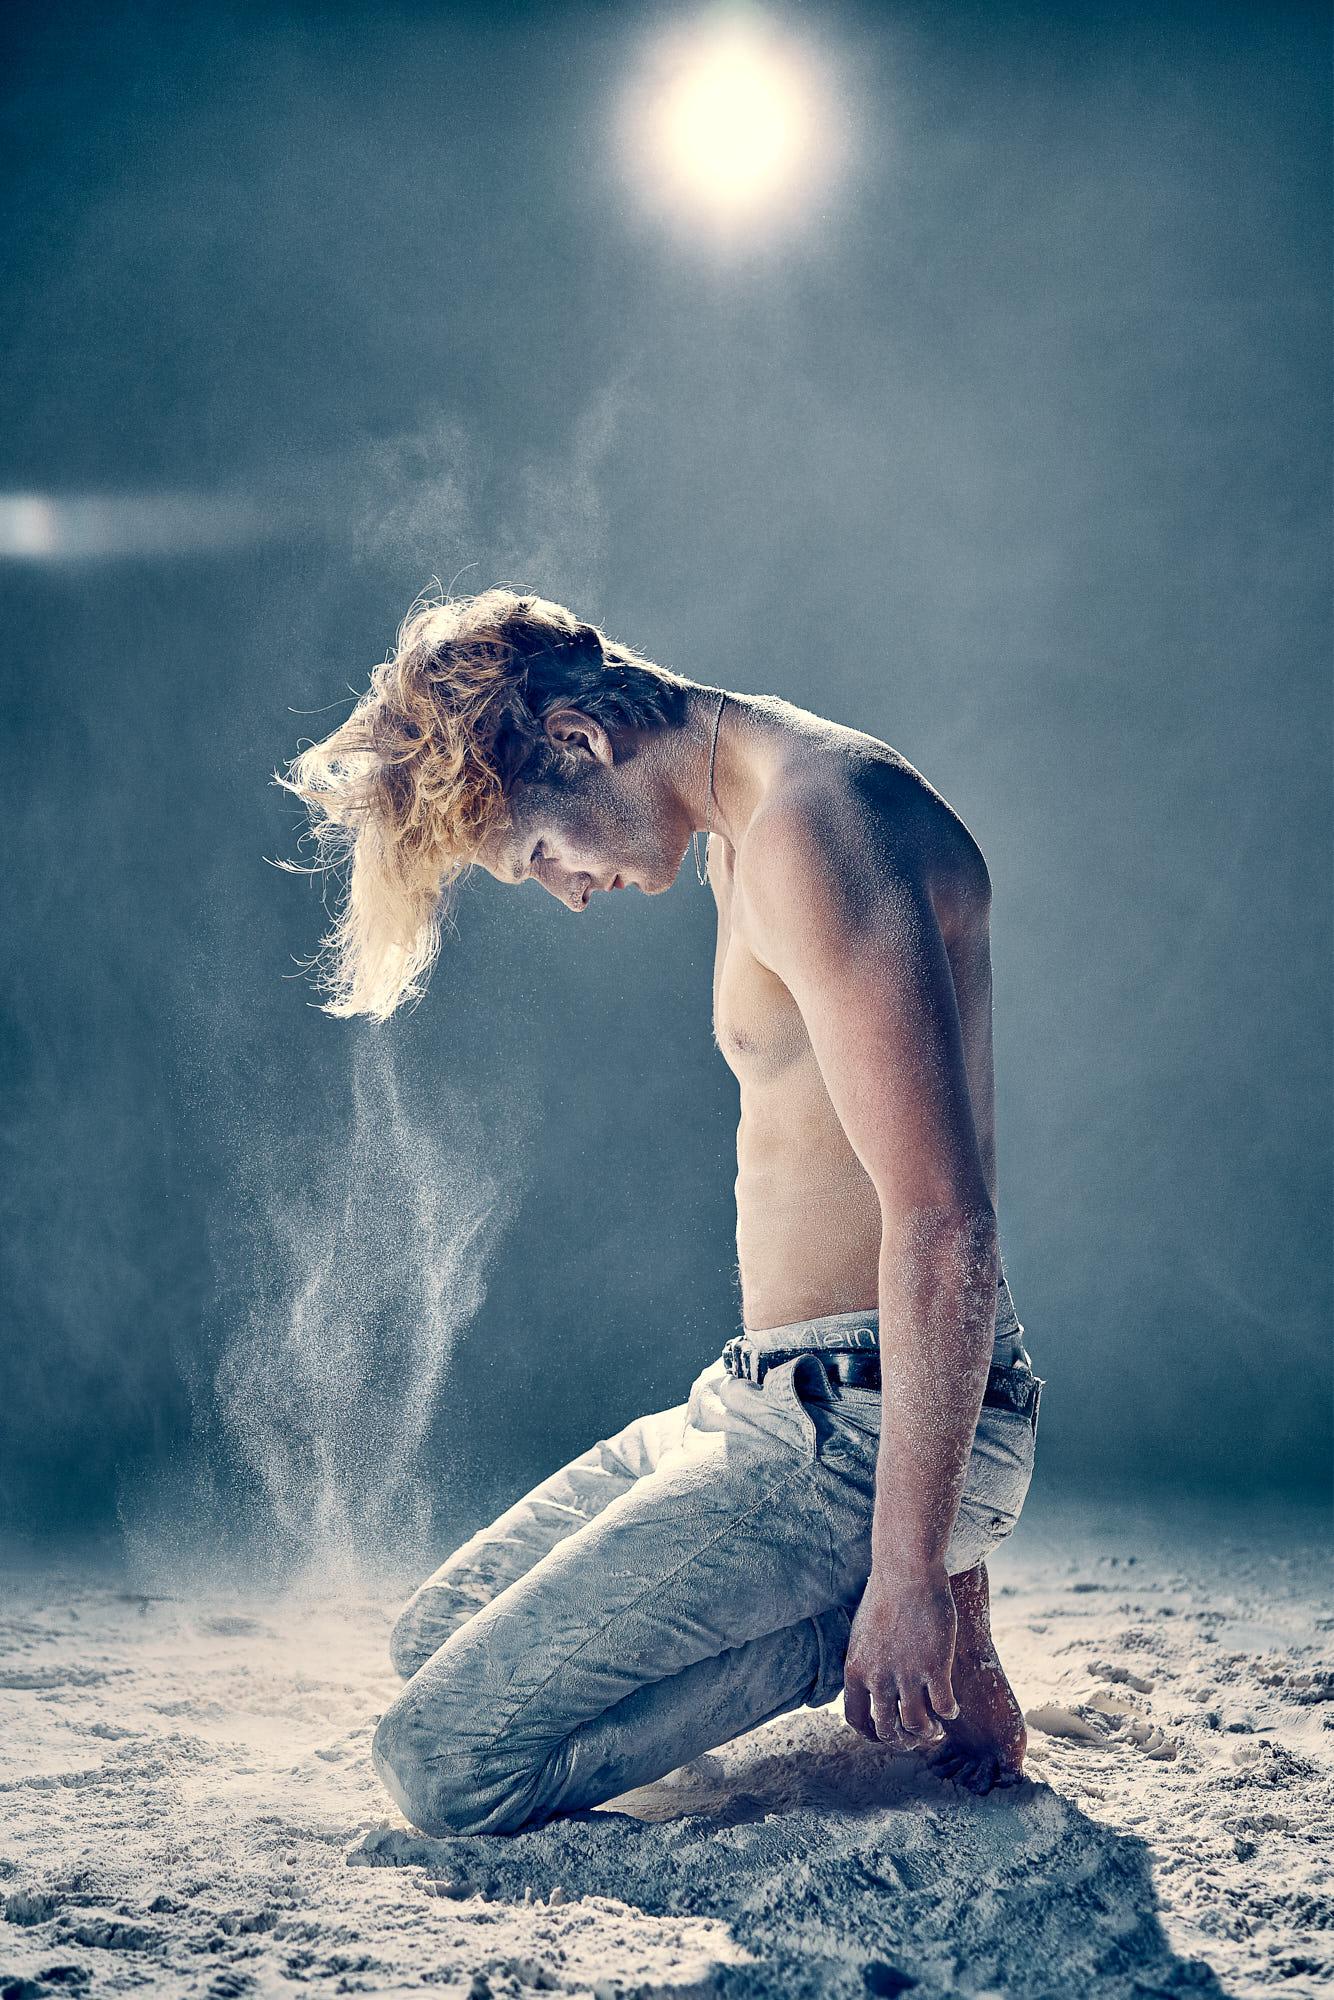 Lex & Josh Powder Break Dance with Magnus 6.jpg